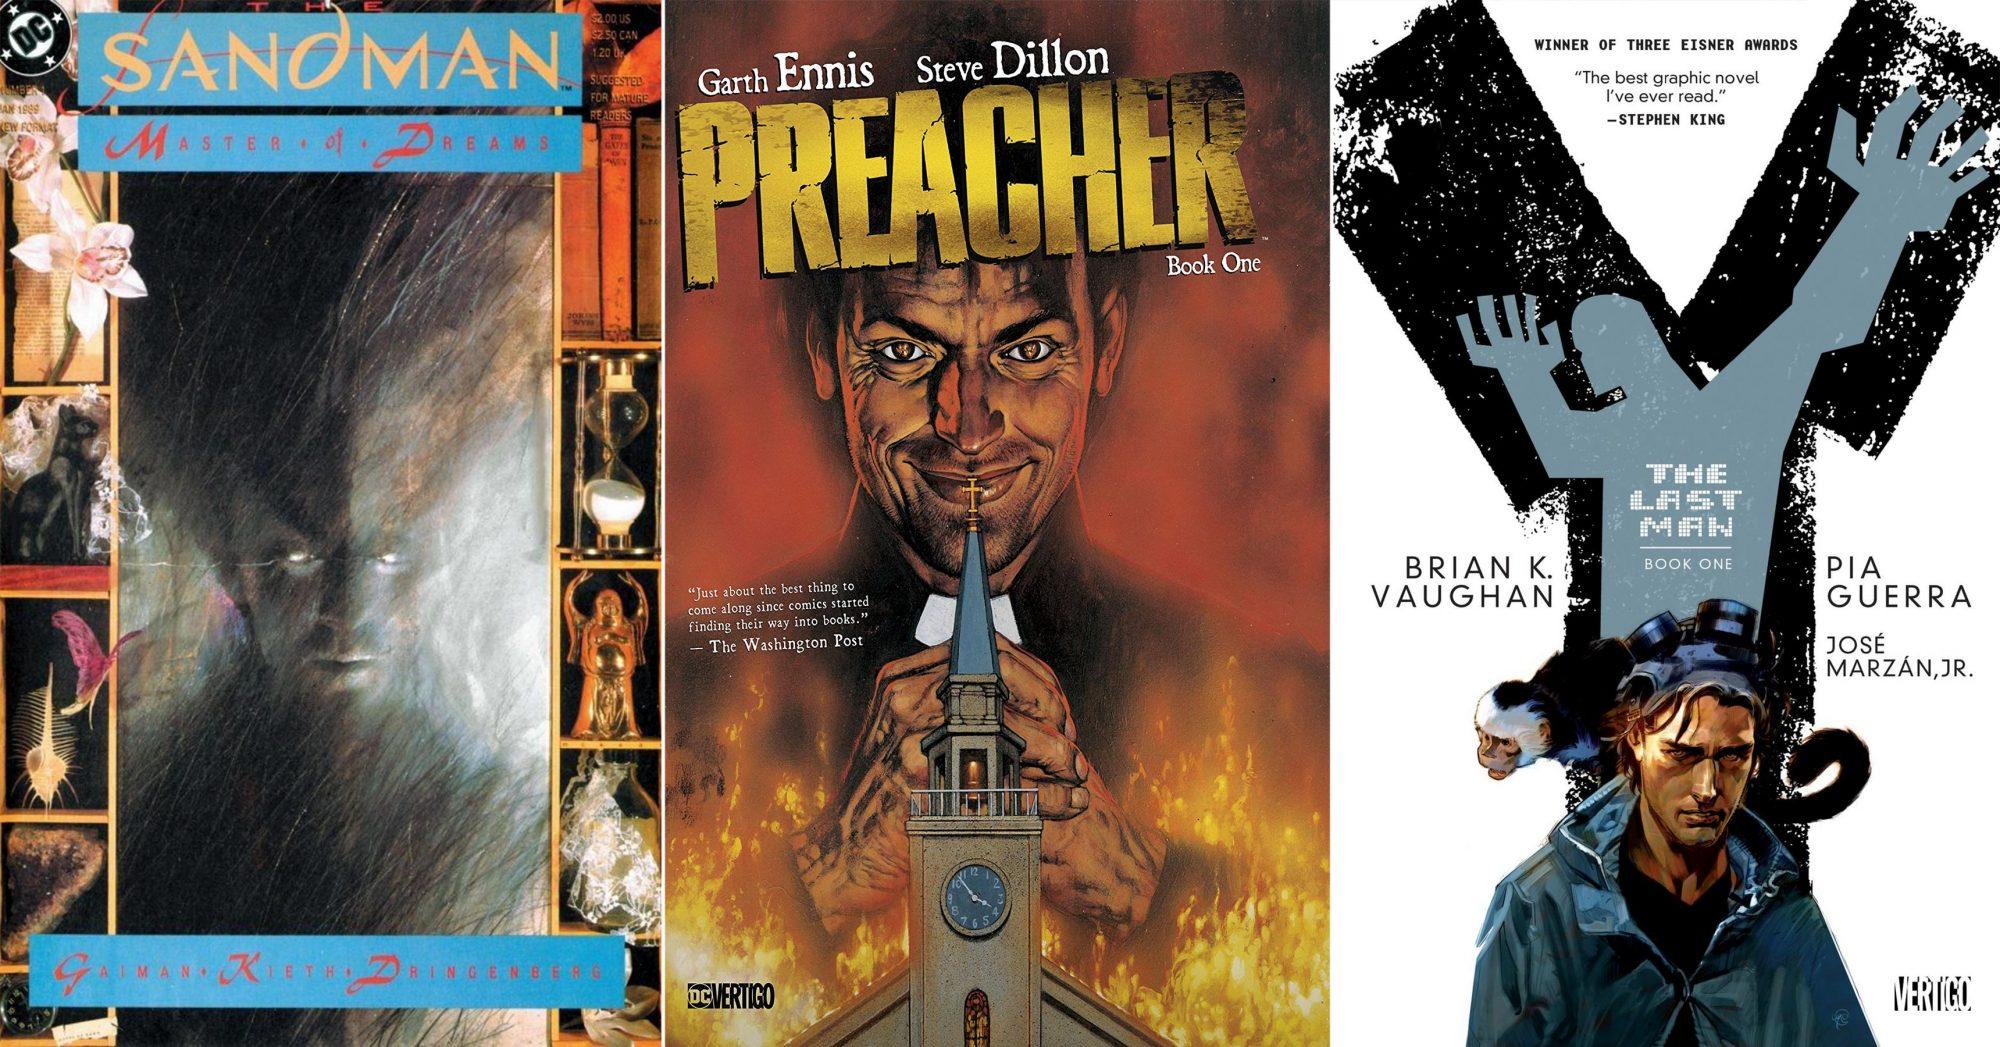 The Sandman #1 CR: Vertigo Preacher: Book One CR: Vertigo Y: The Last Man: Book One CR: Vertigo